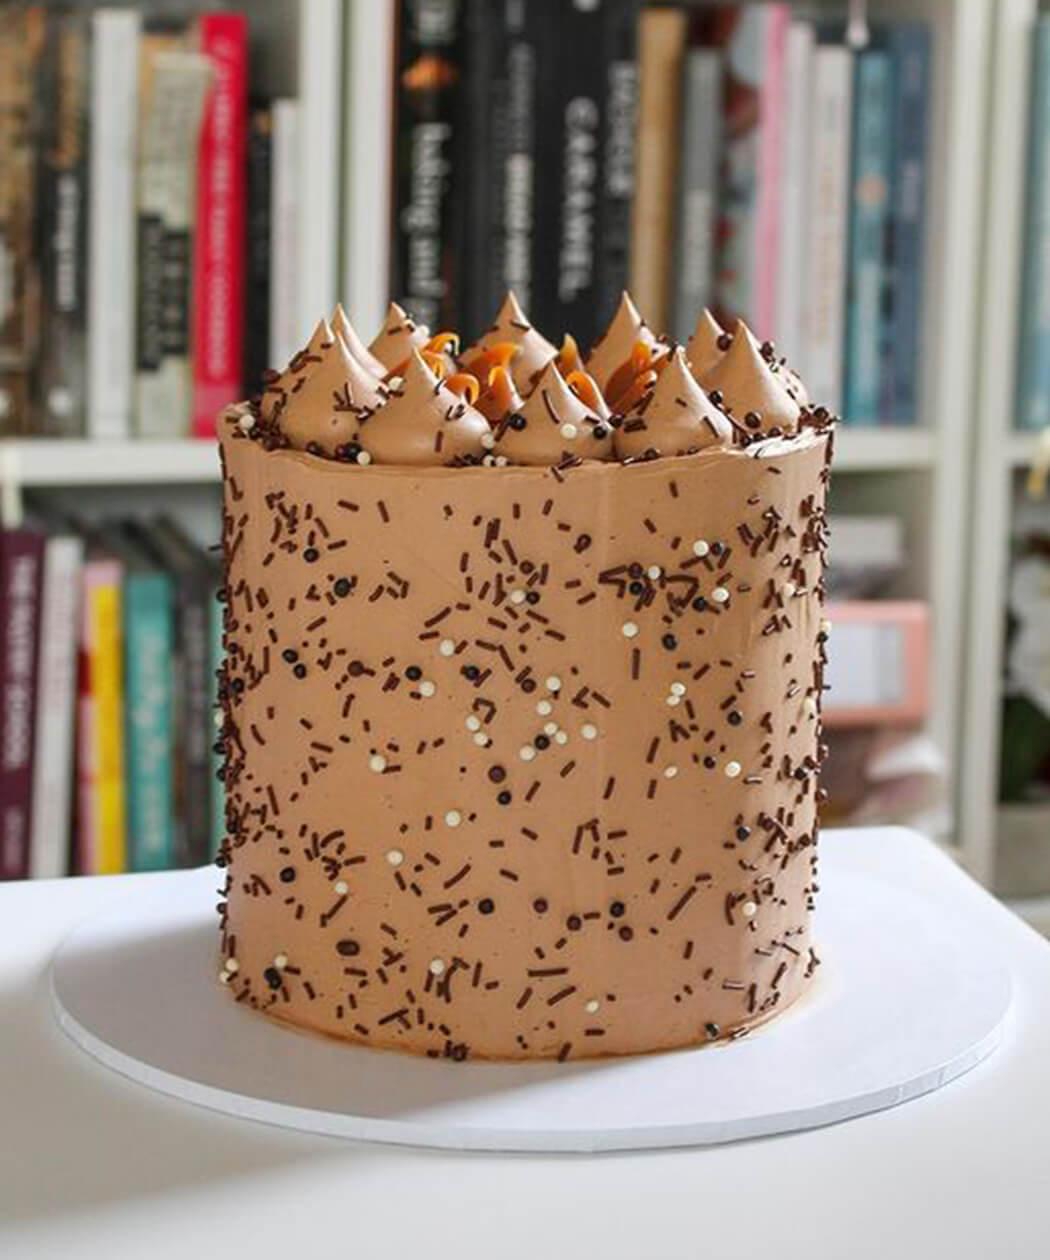 Peach Patisserie bespoke cake image